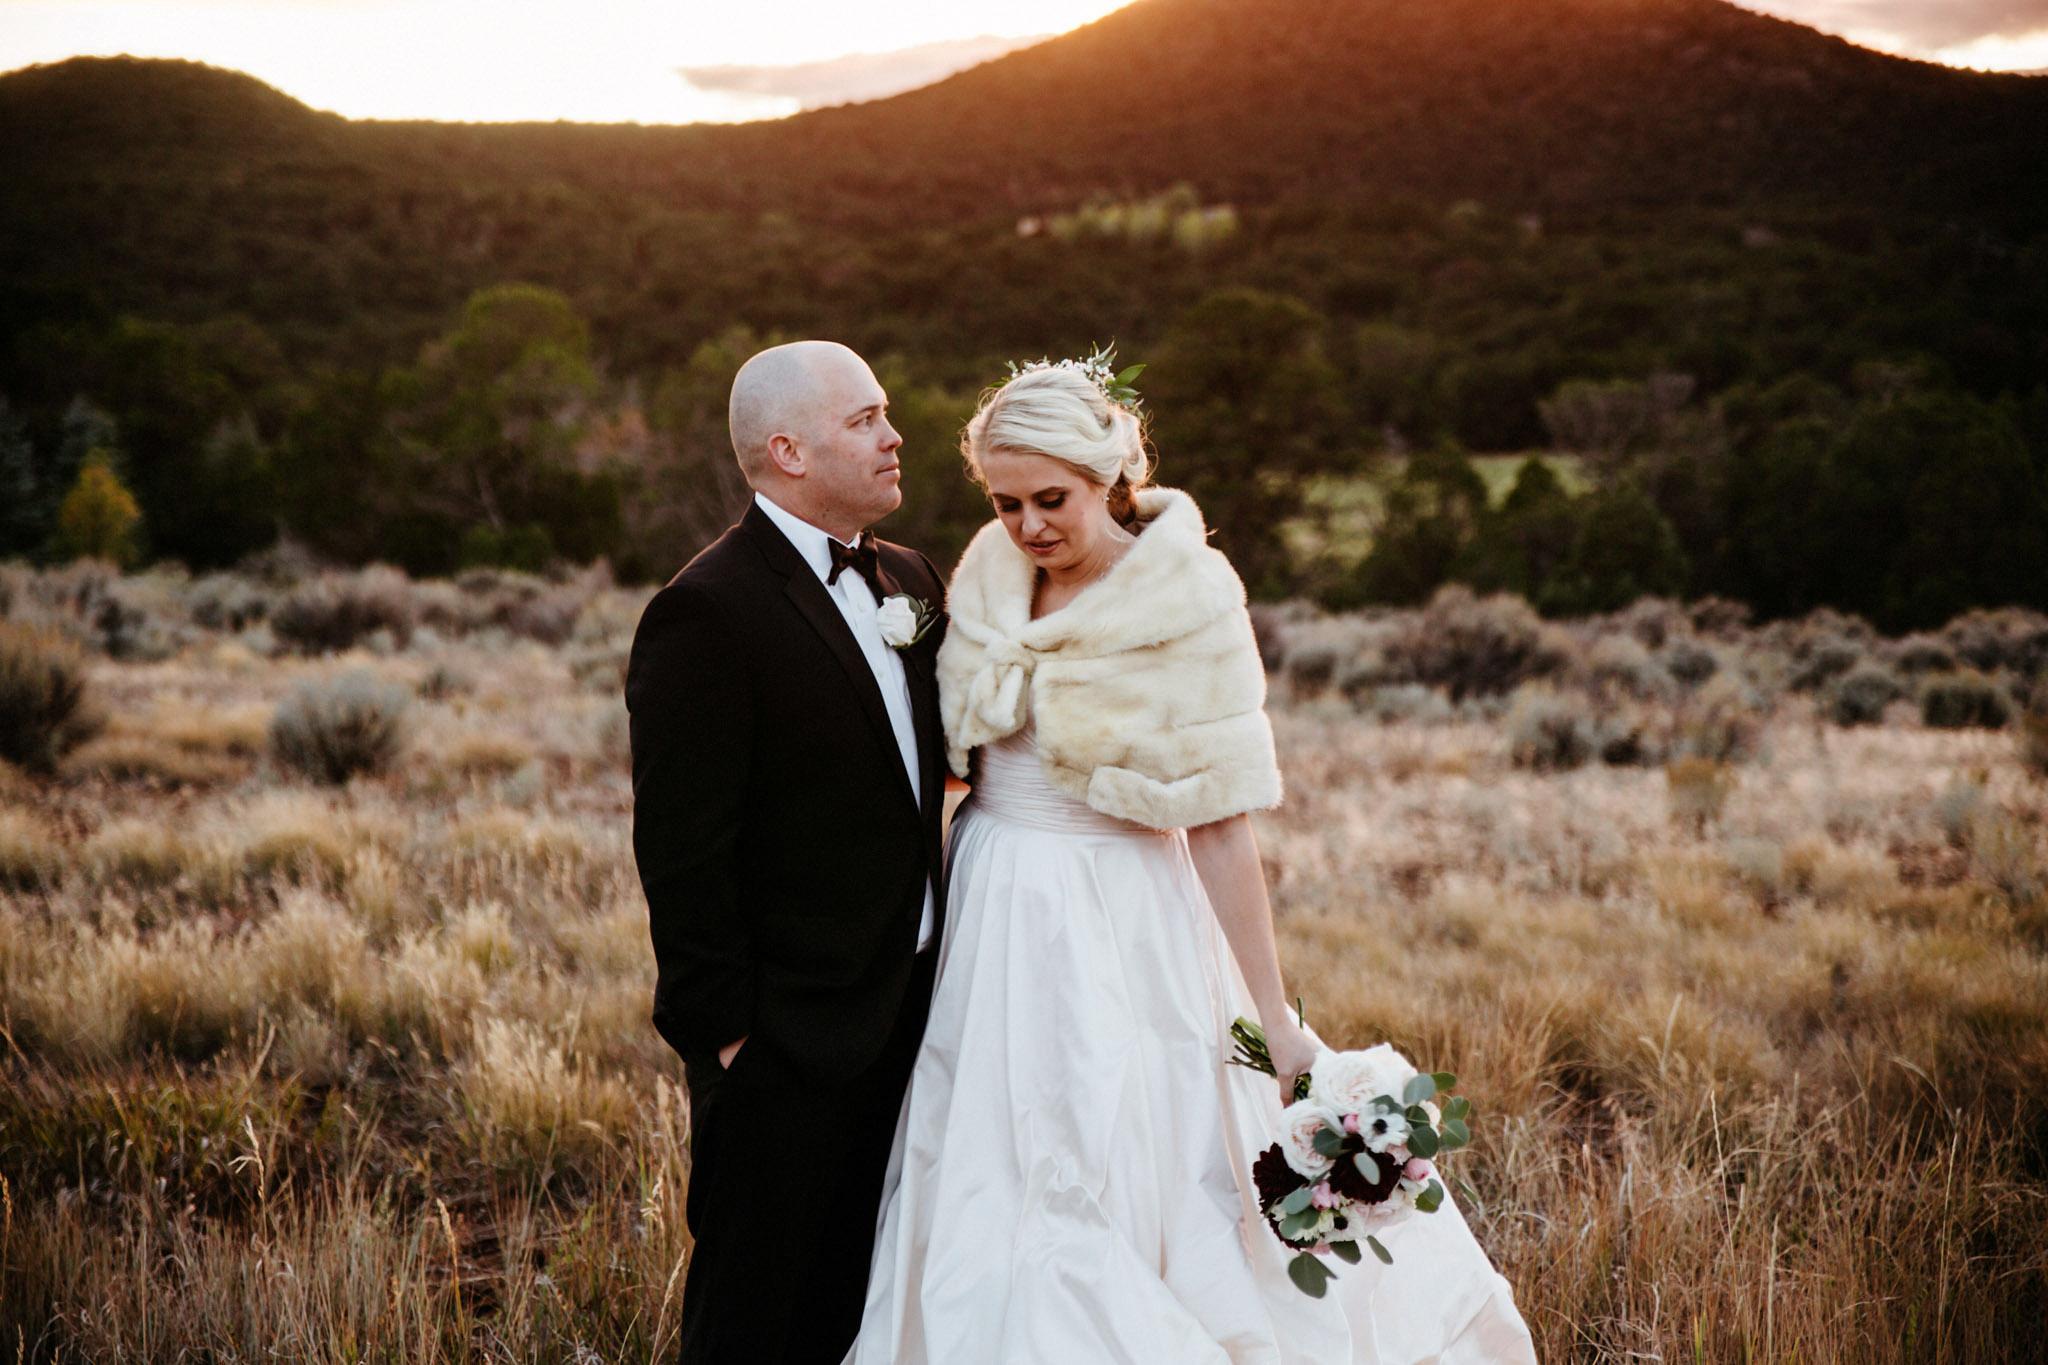 13Aspen Colorado Wedding_Kindling Wedding Photography_30.JPG